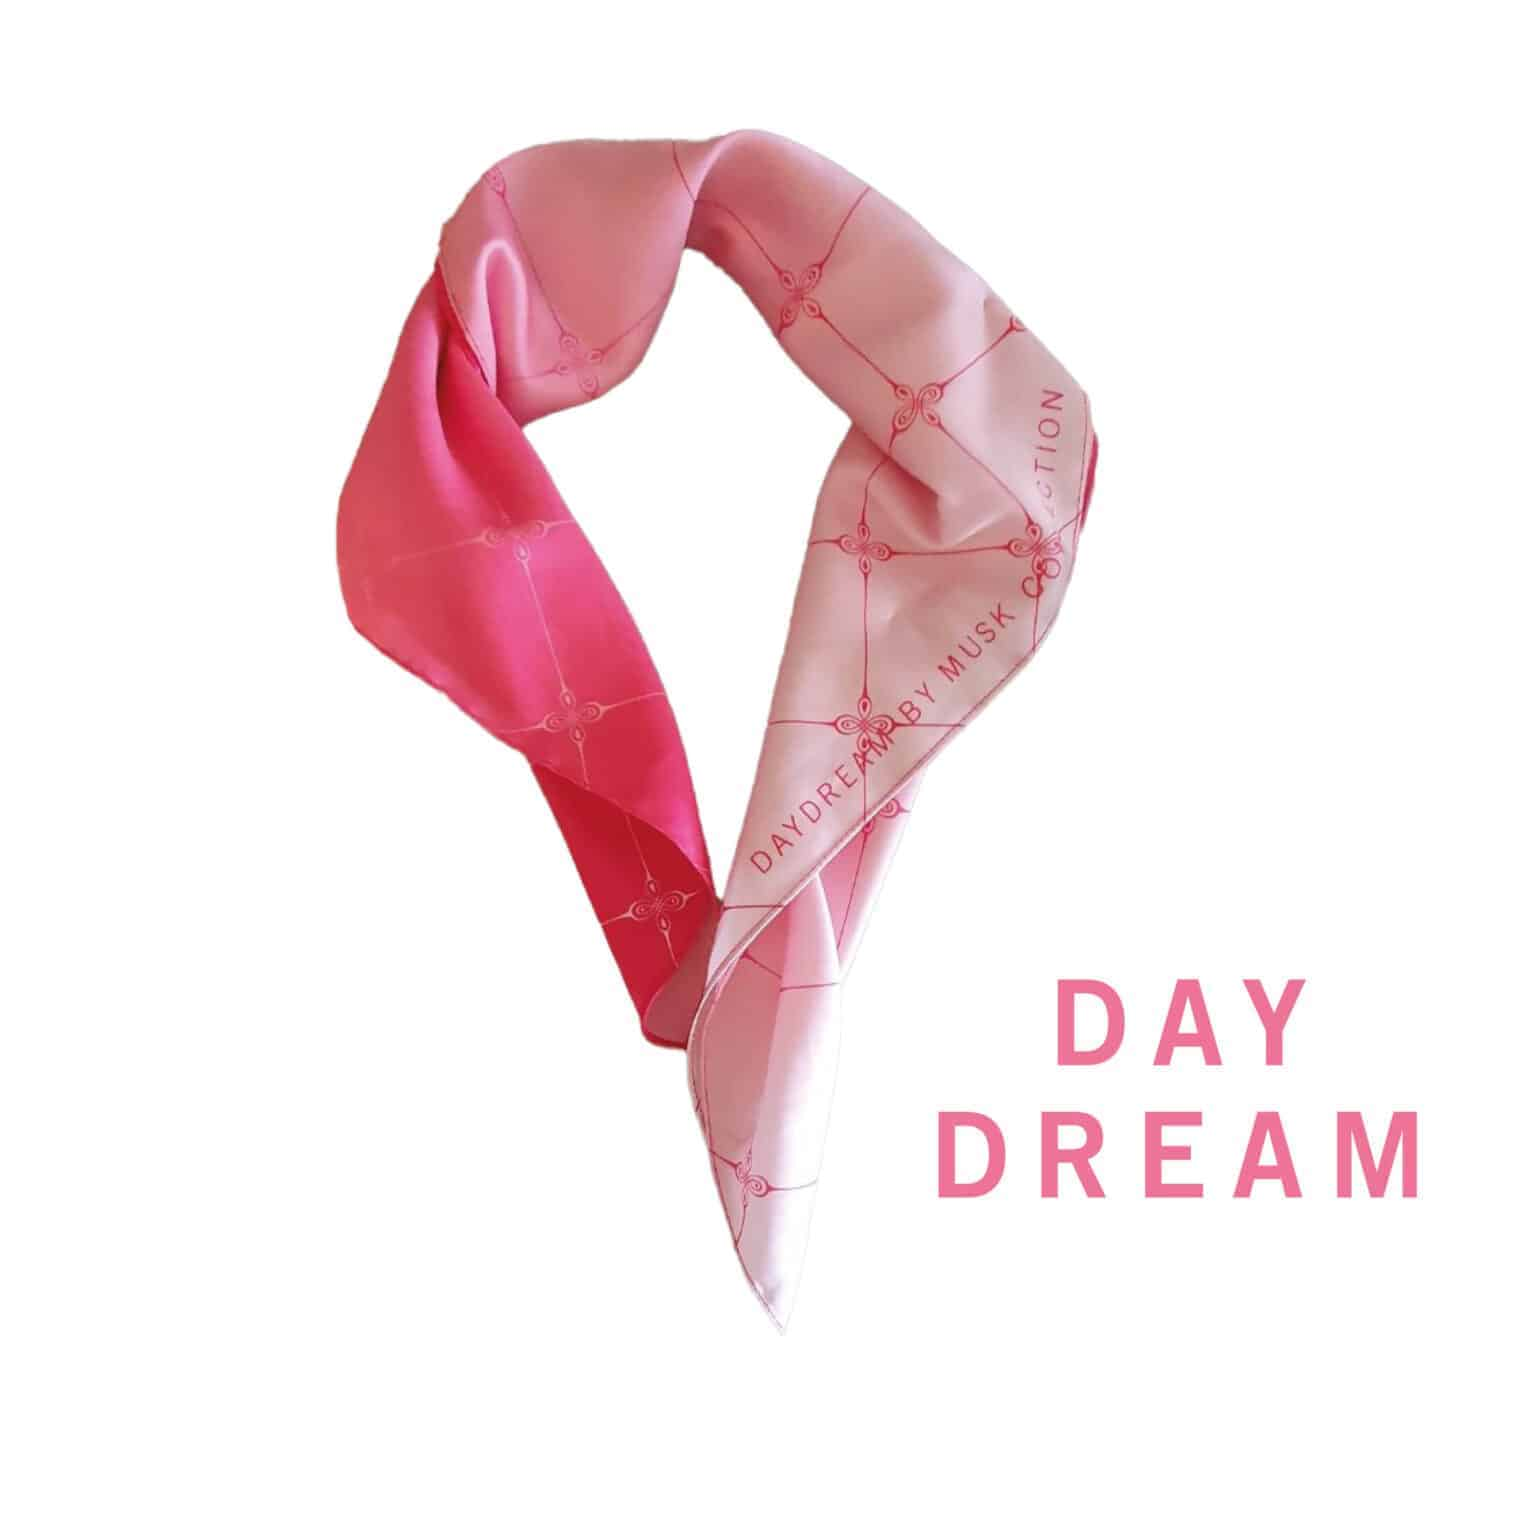 Bandana Daydream Hals Mit Logo